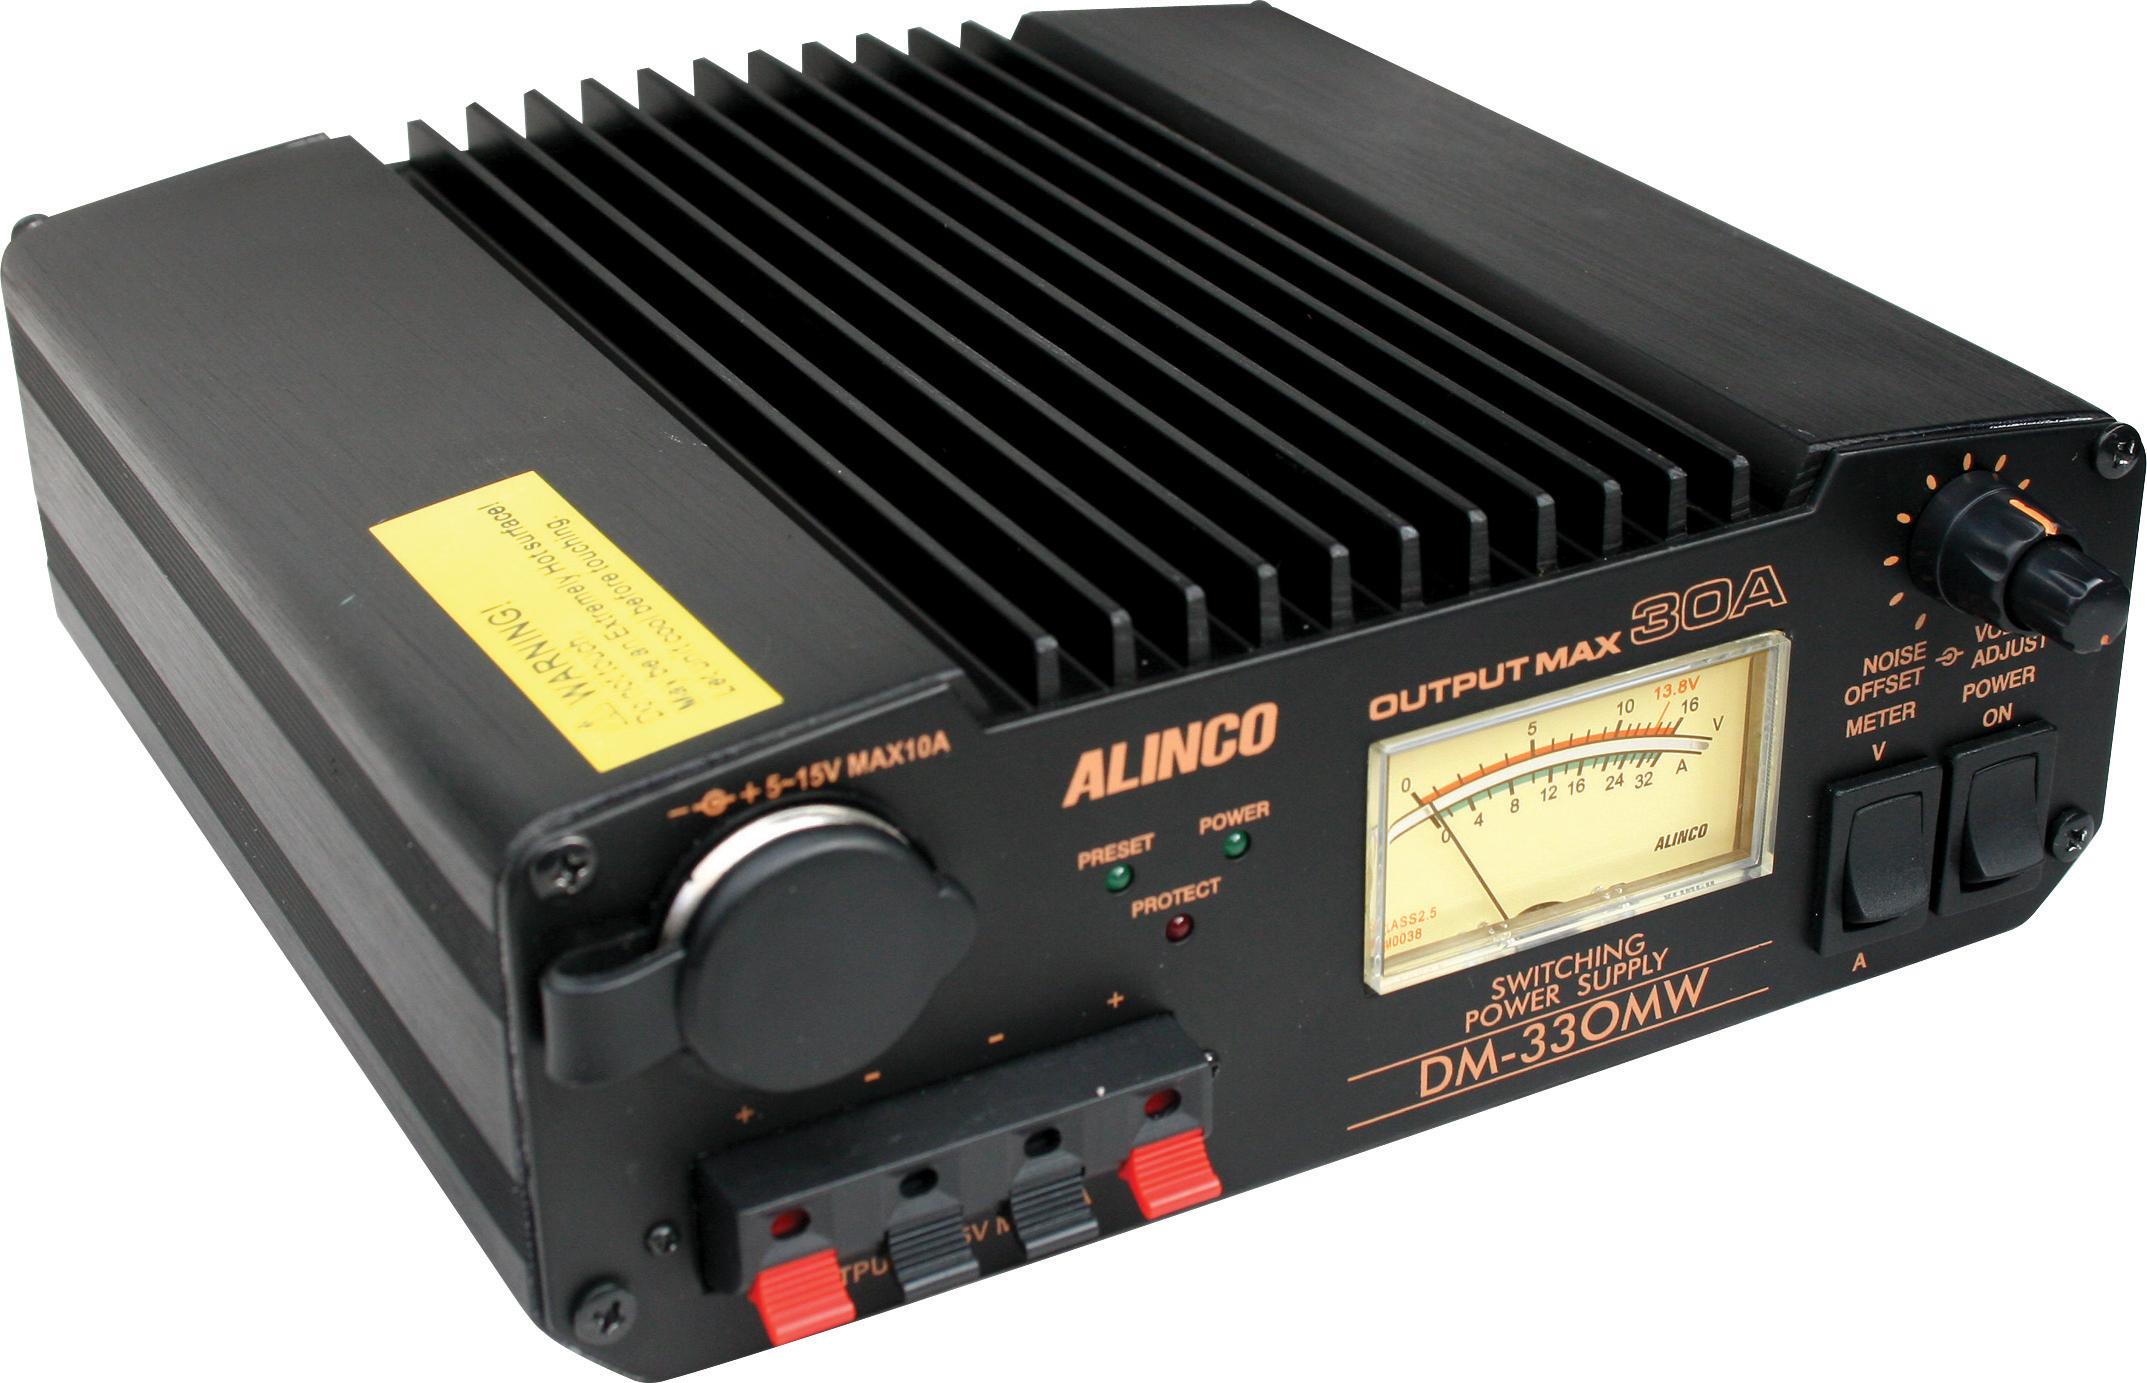 Alinco DM-330MW